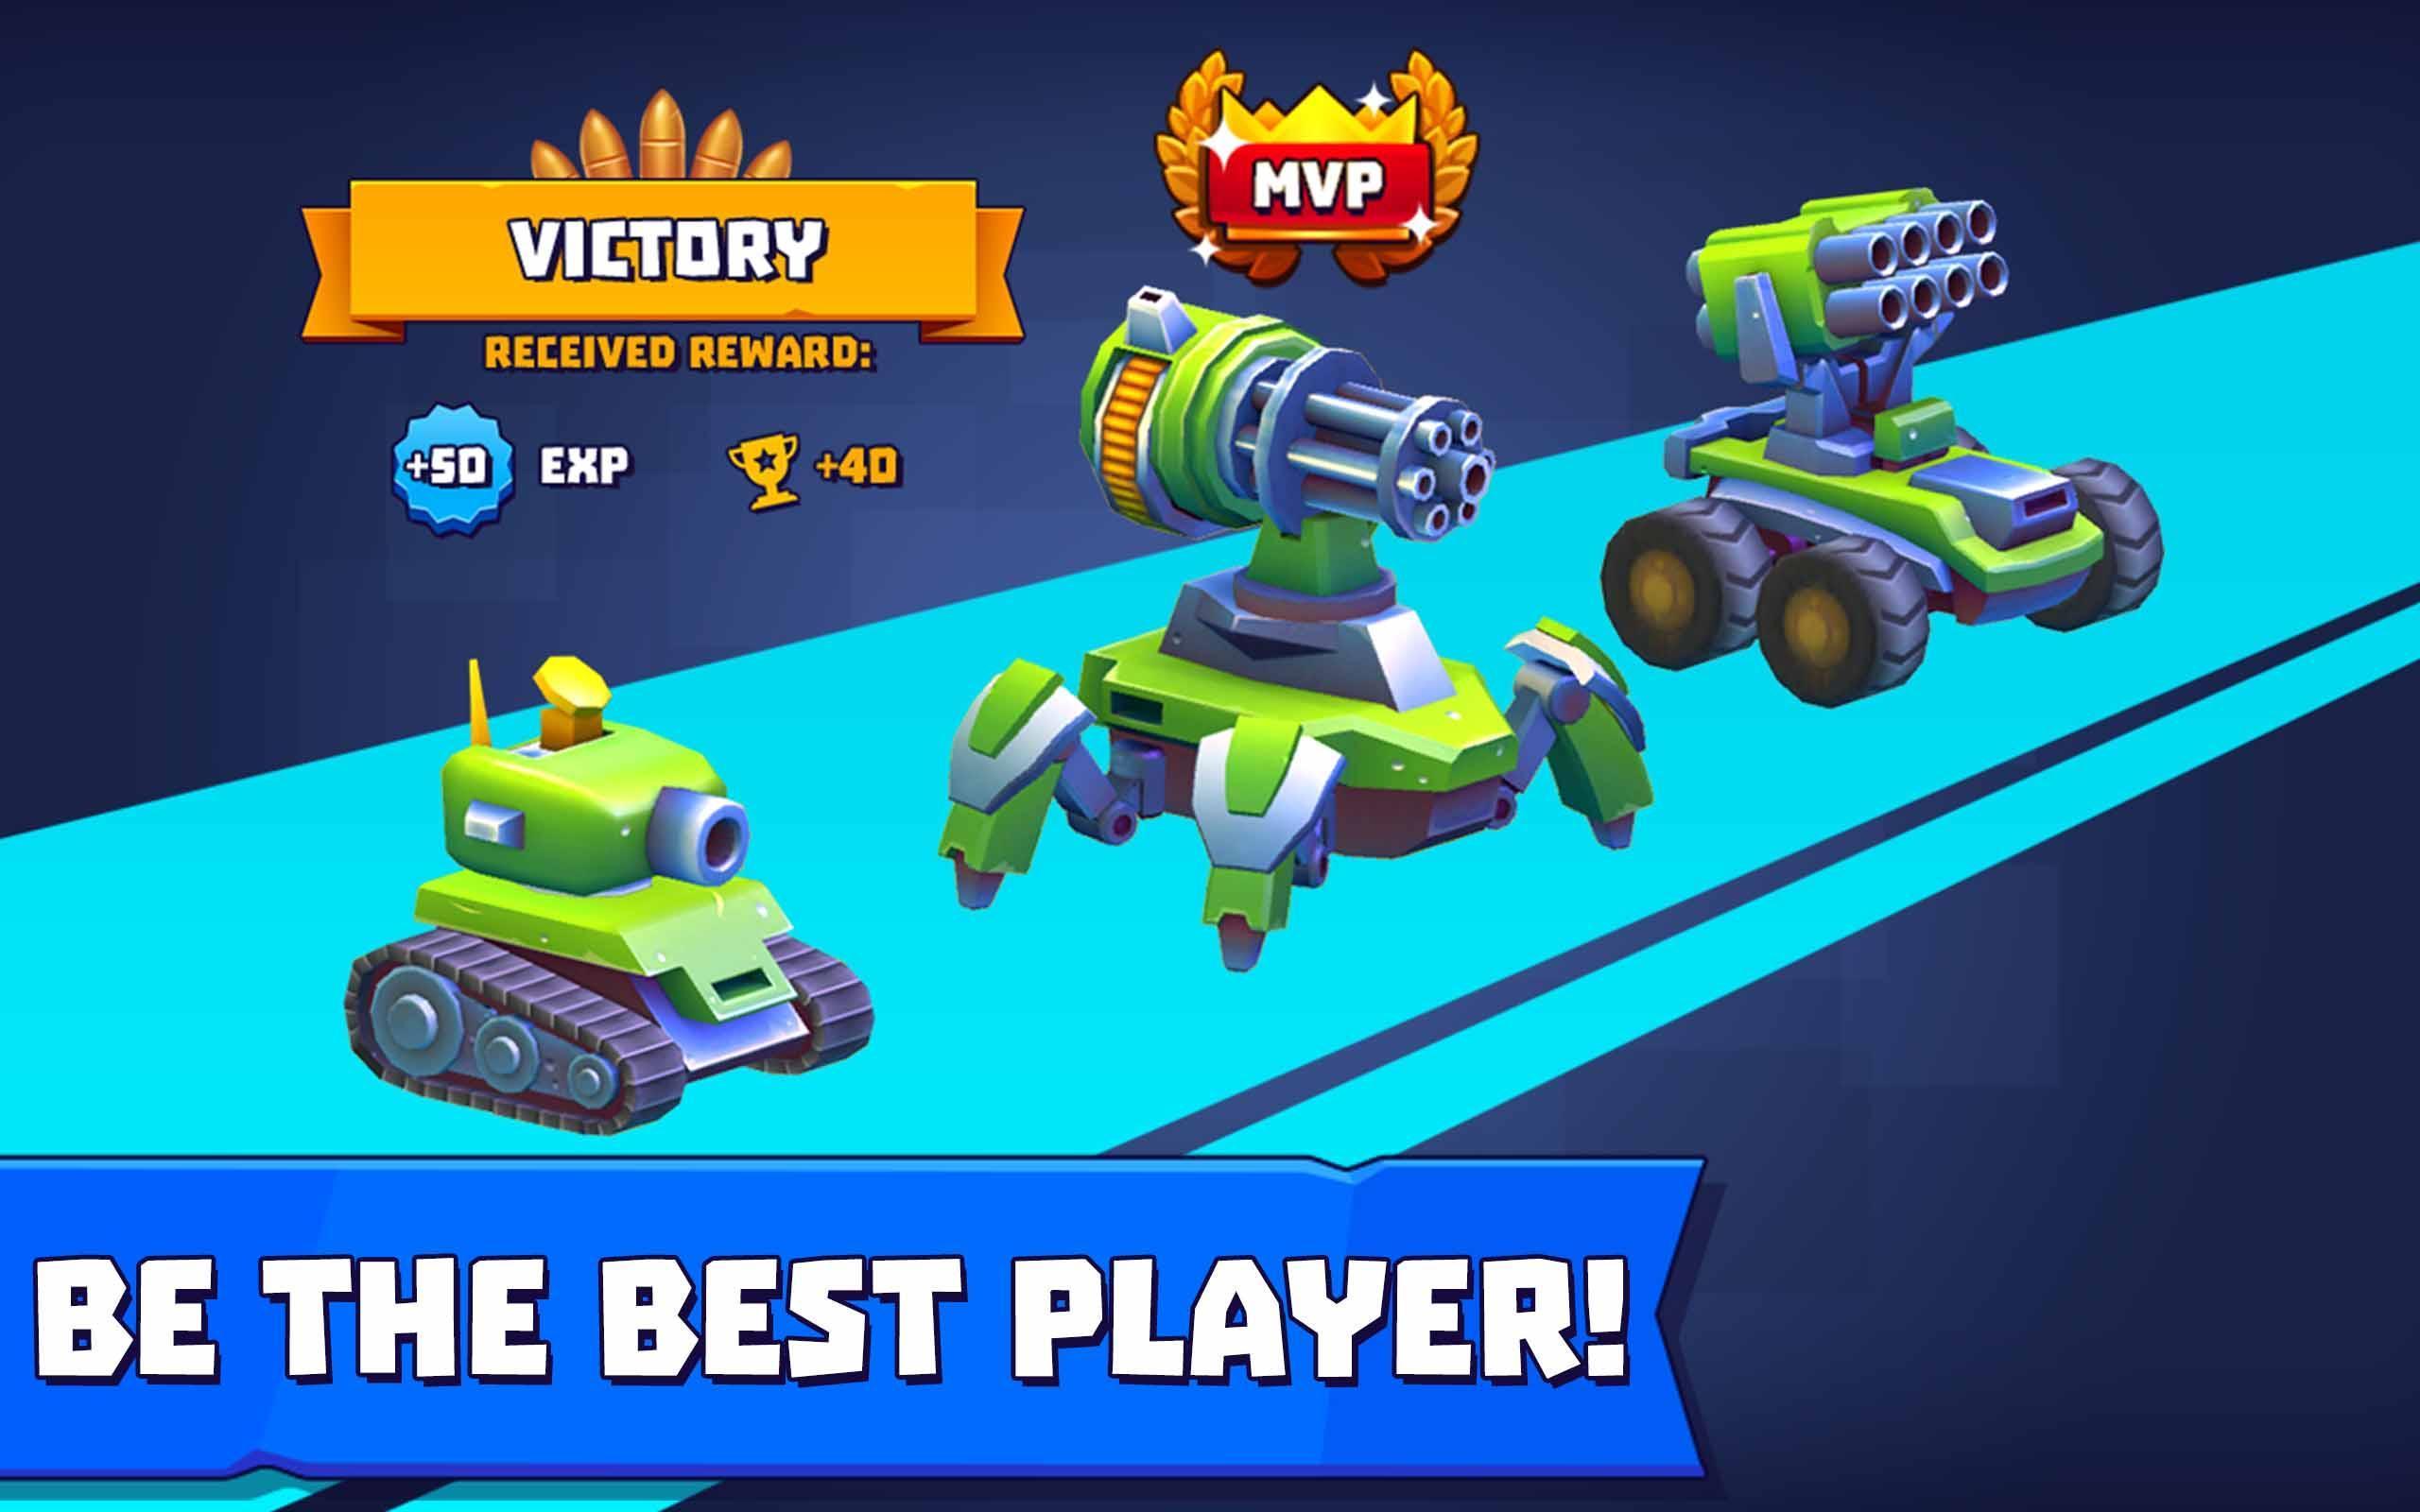 Tanks A Lot! - Realtime Multiplayer Battle Arena 2.56 Screenshot 21